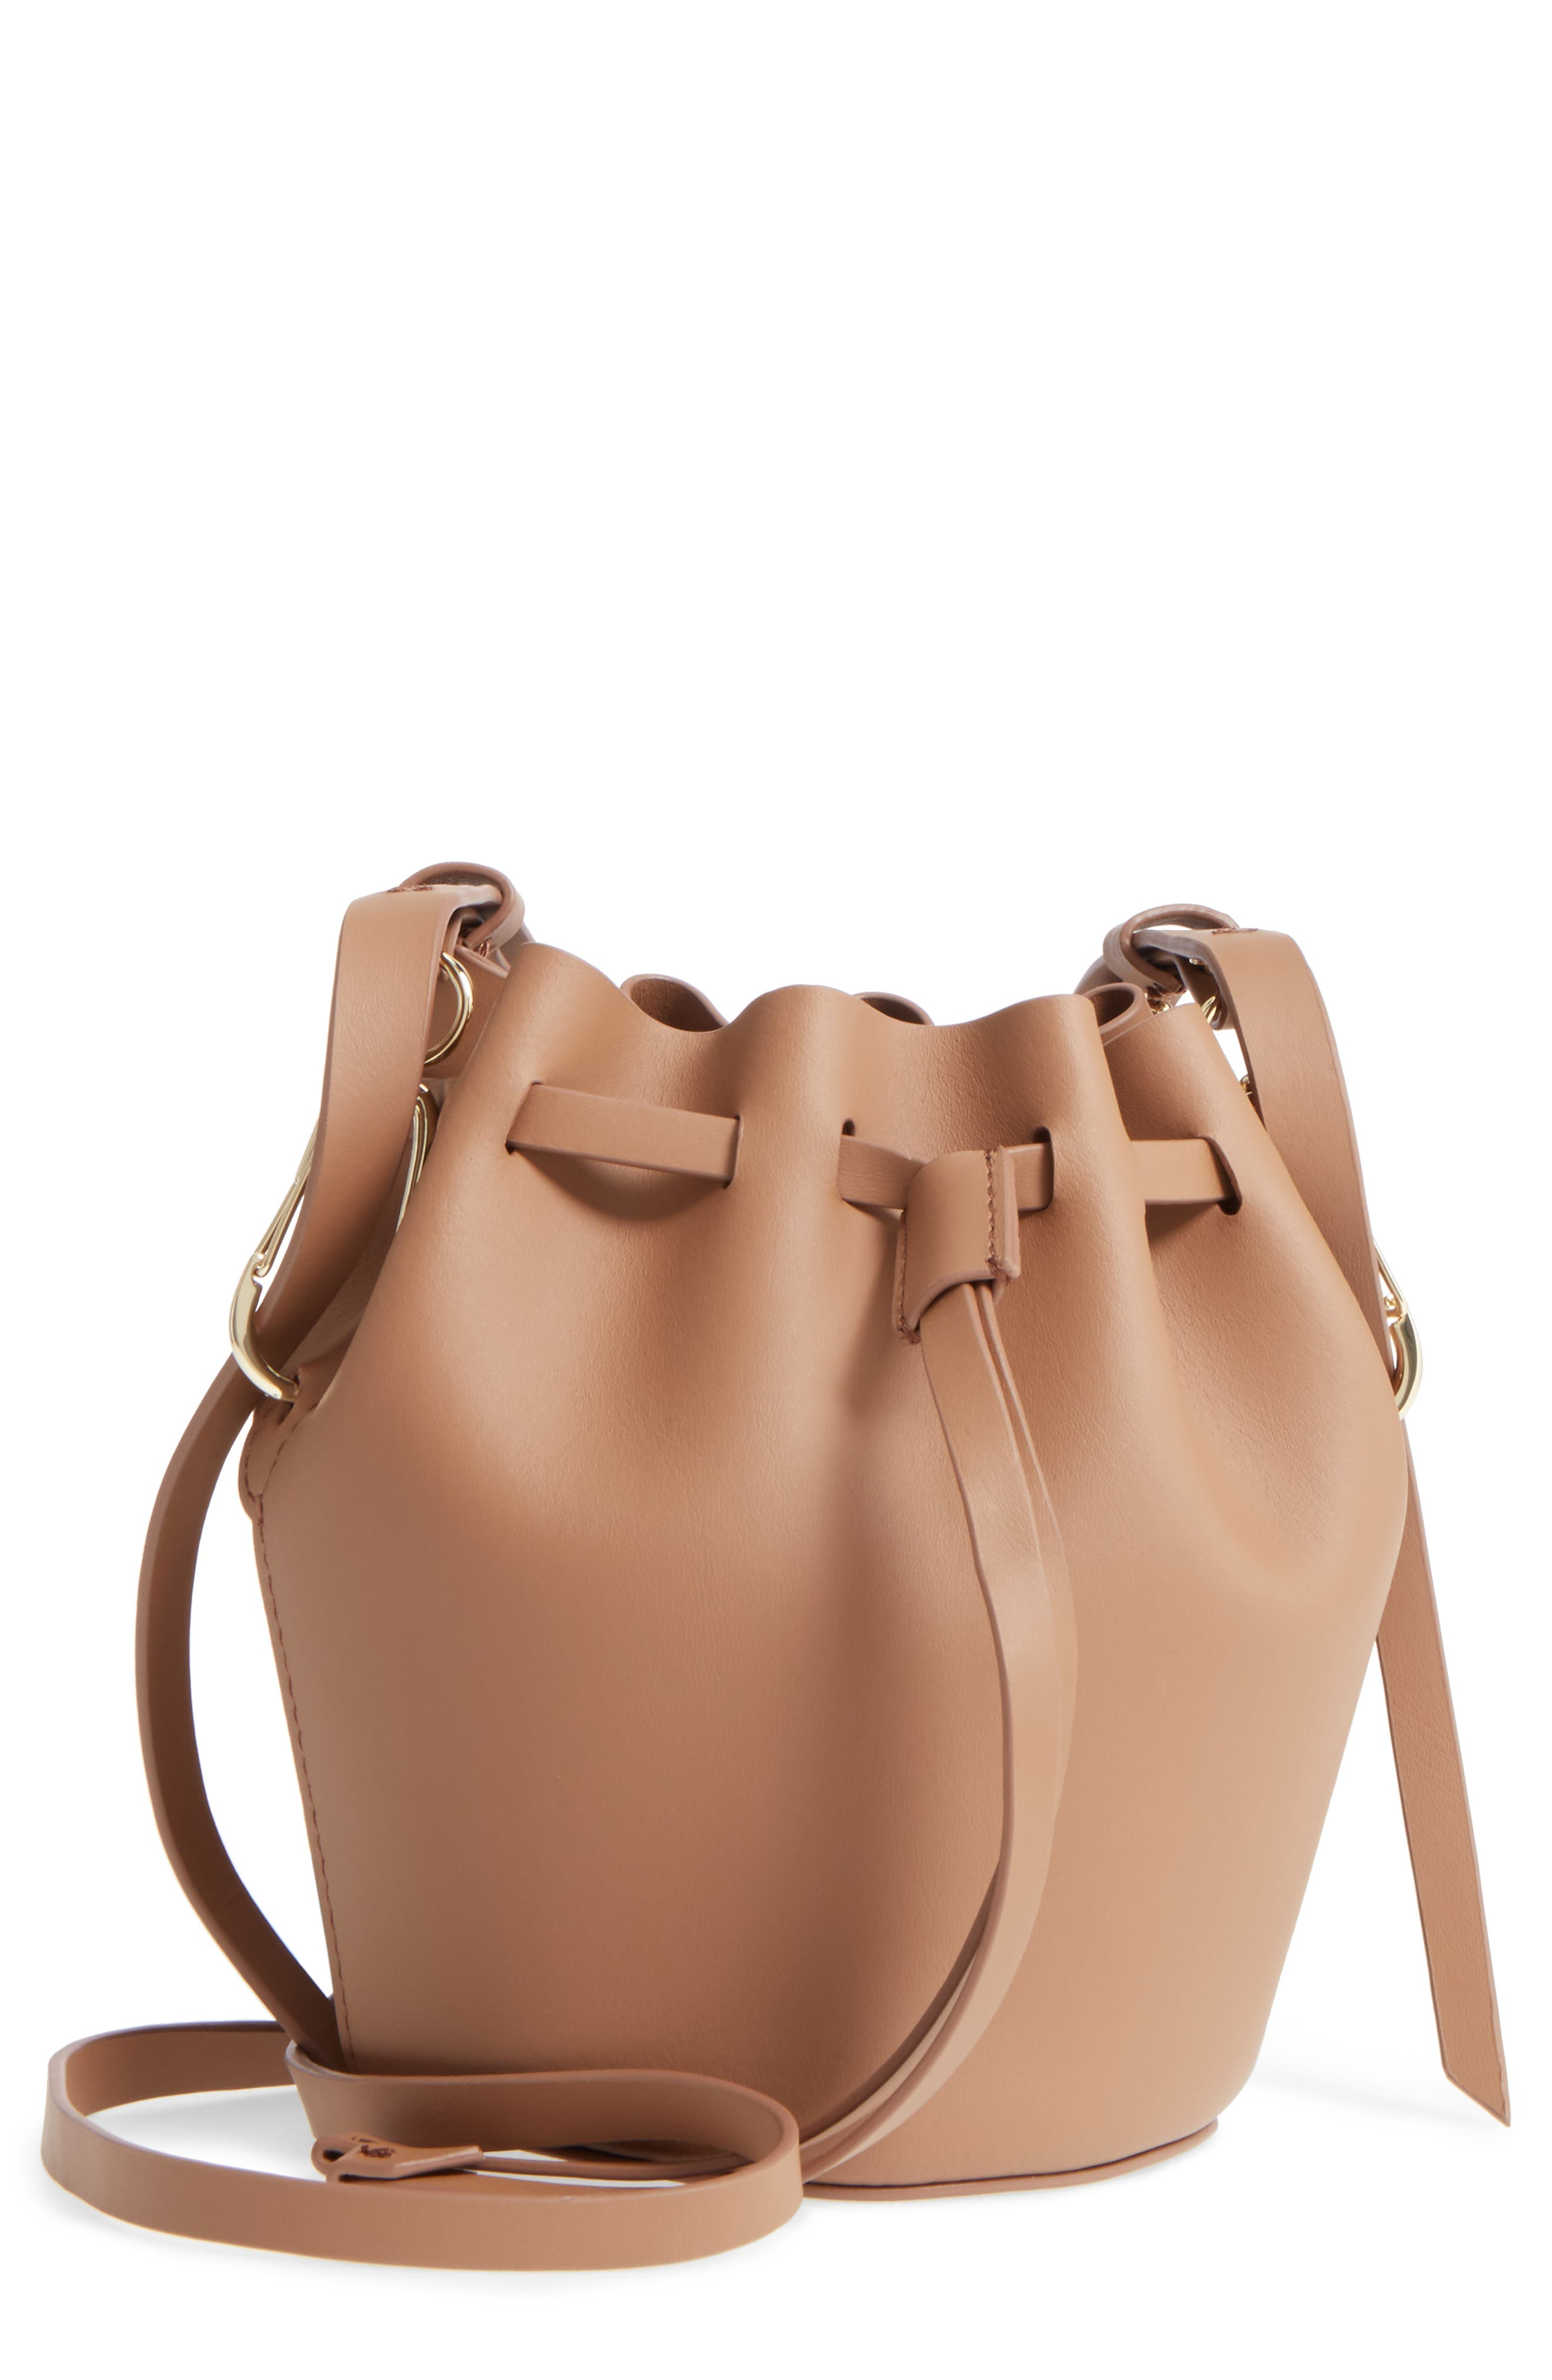 Mini Belay Calfskin Leather Drawstring Bag,                             Main thumbnail 1, color,                             250